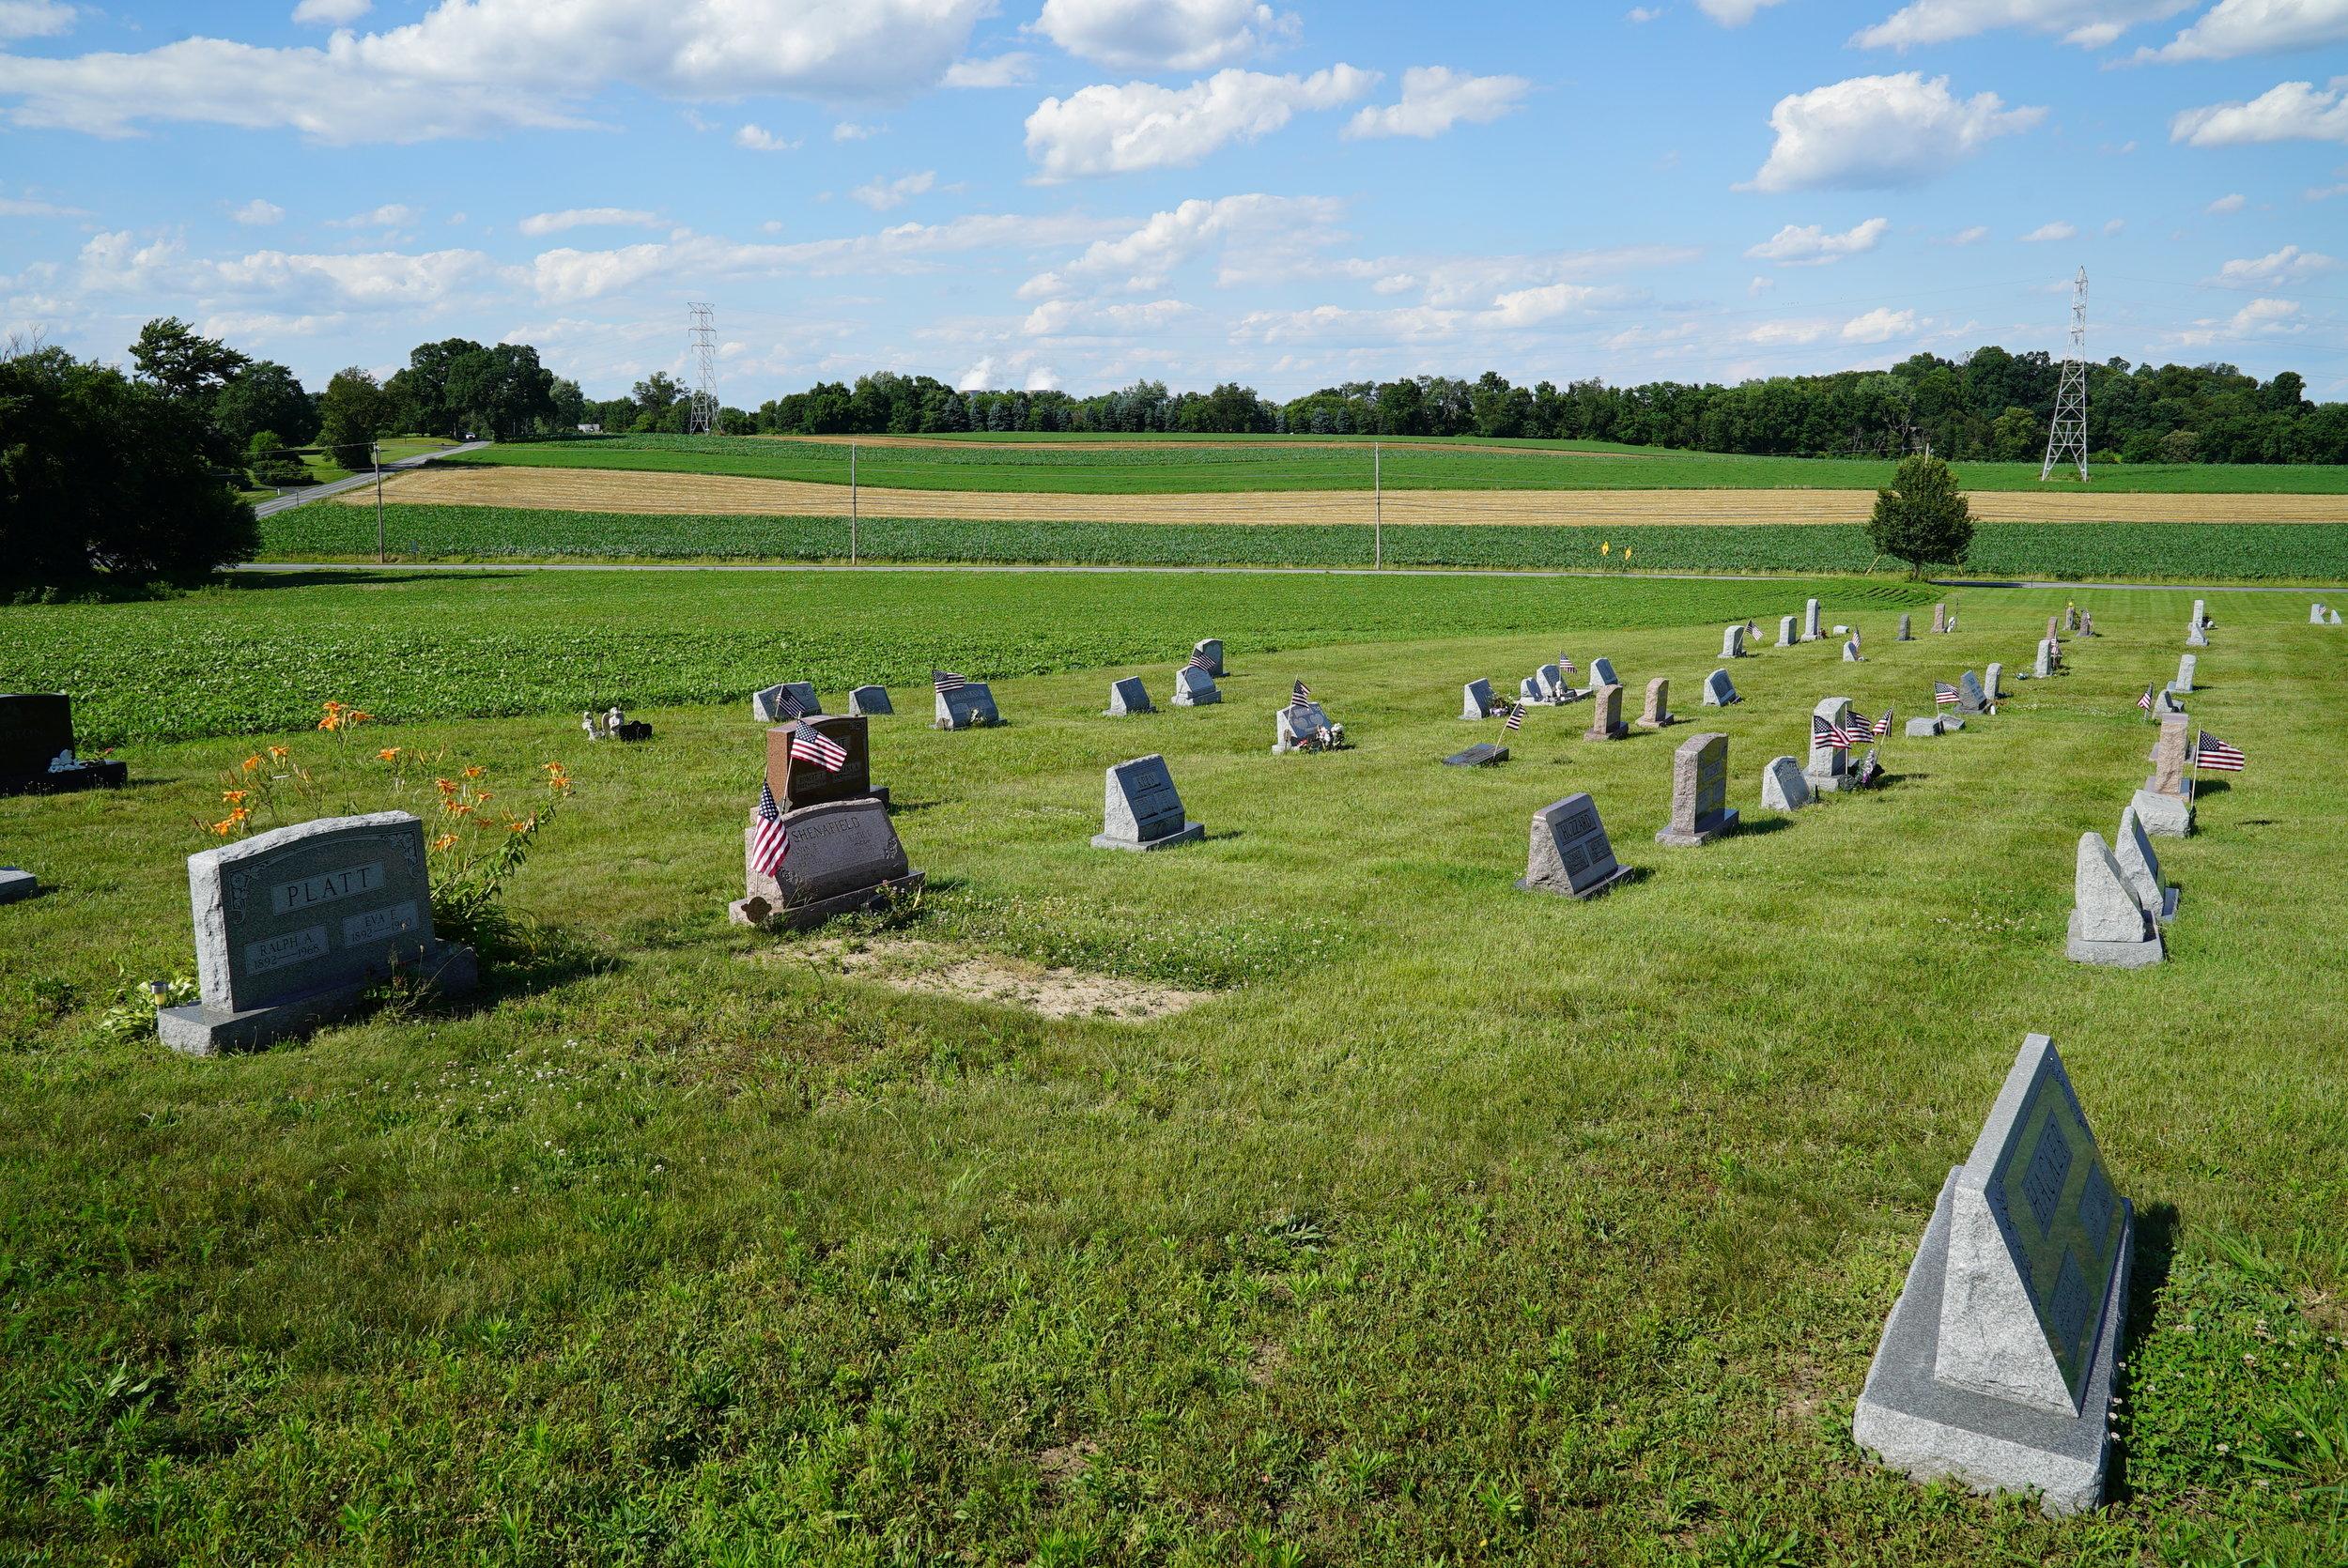 Bethel Uuited Methodist Church Cemetery. Spring City, Pennsylvania.